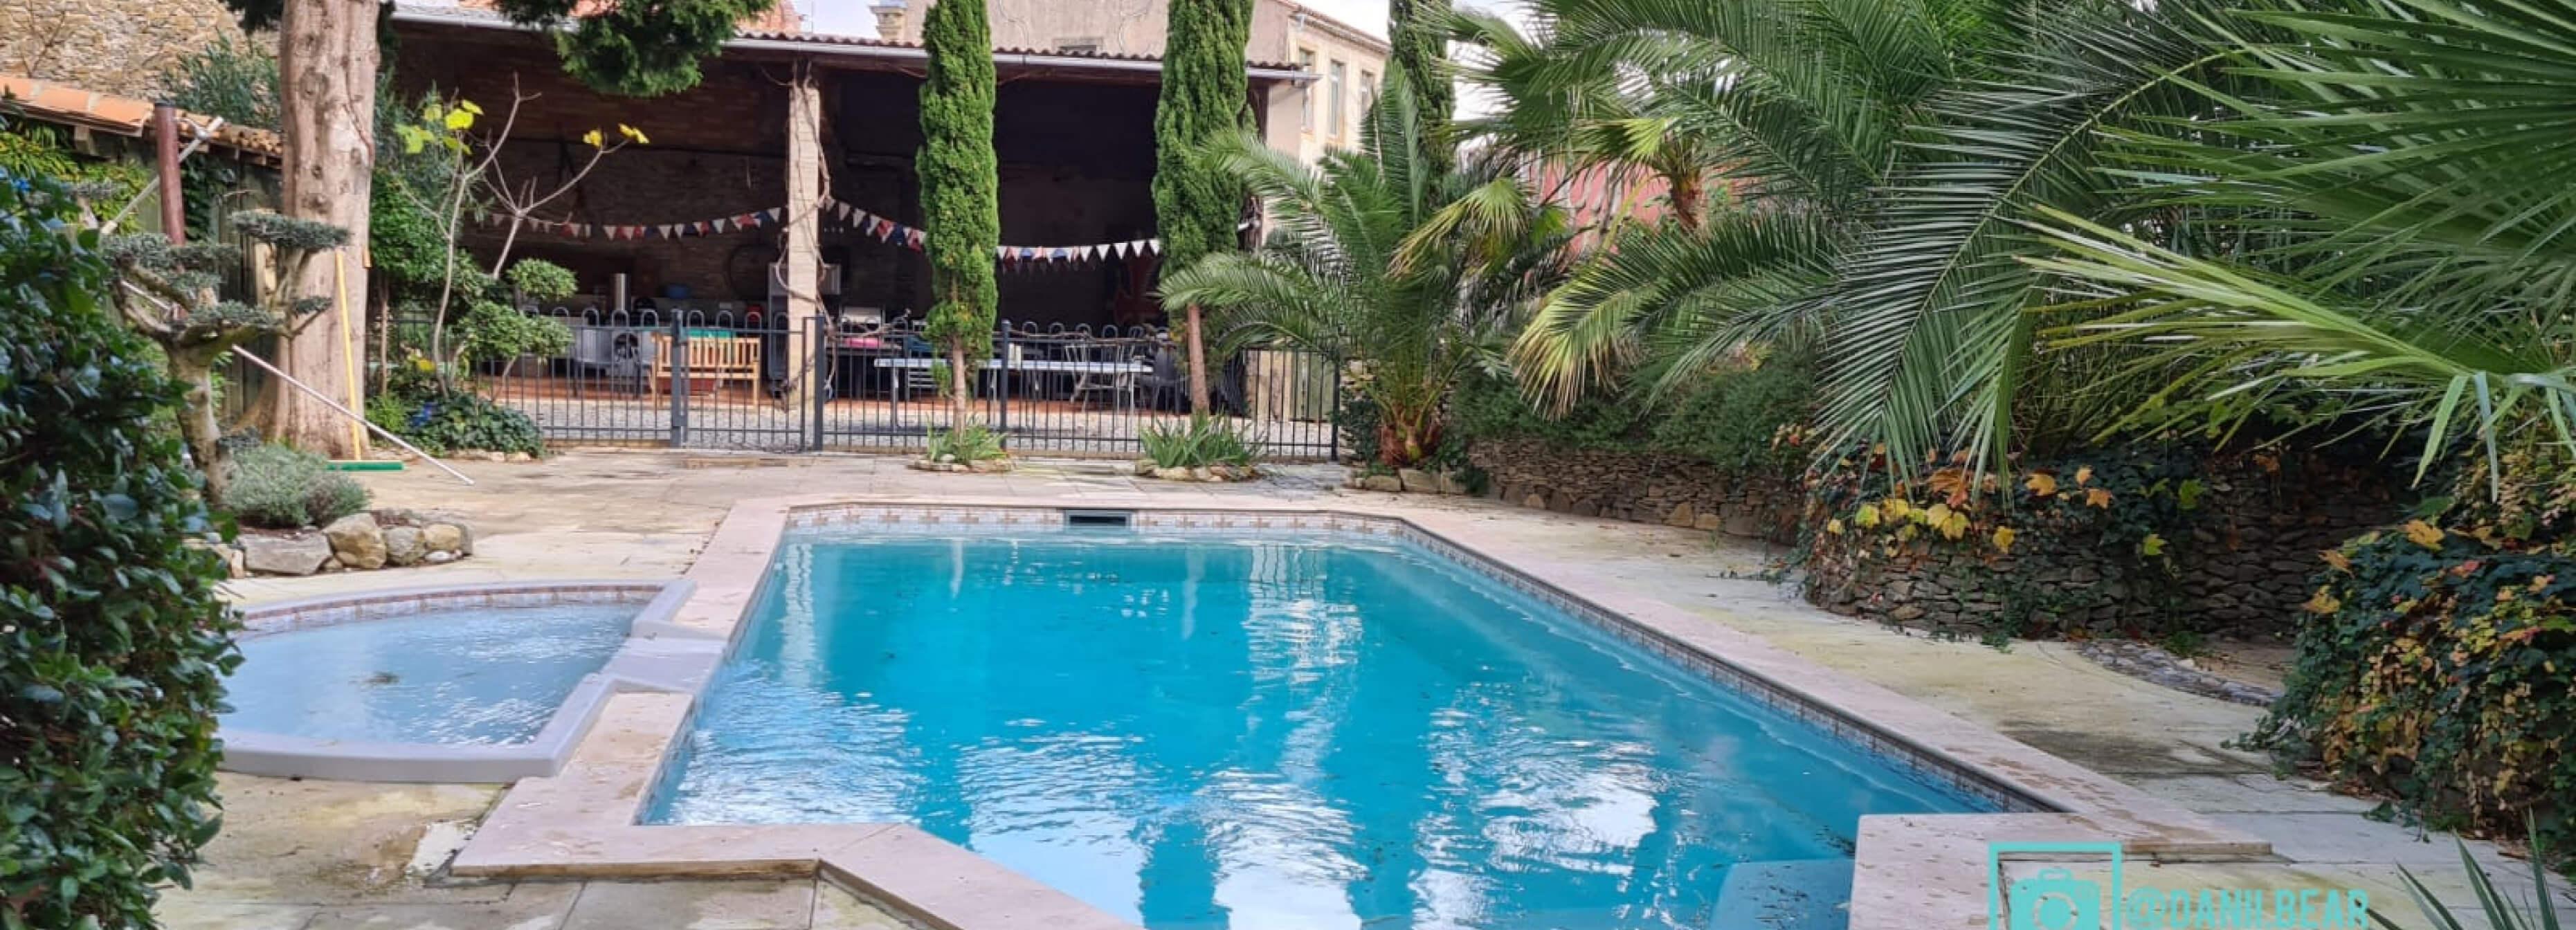 Pool La Maison